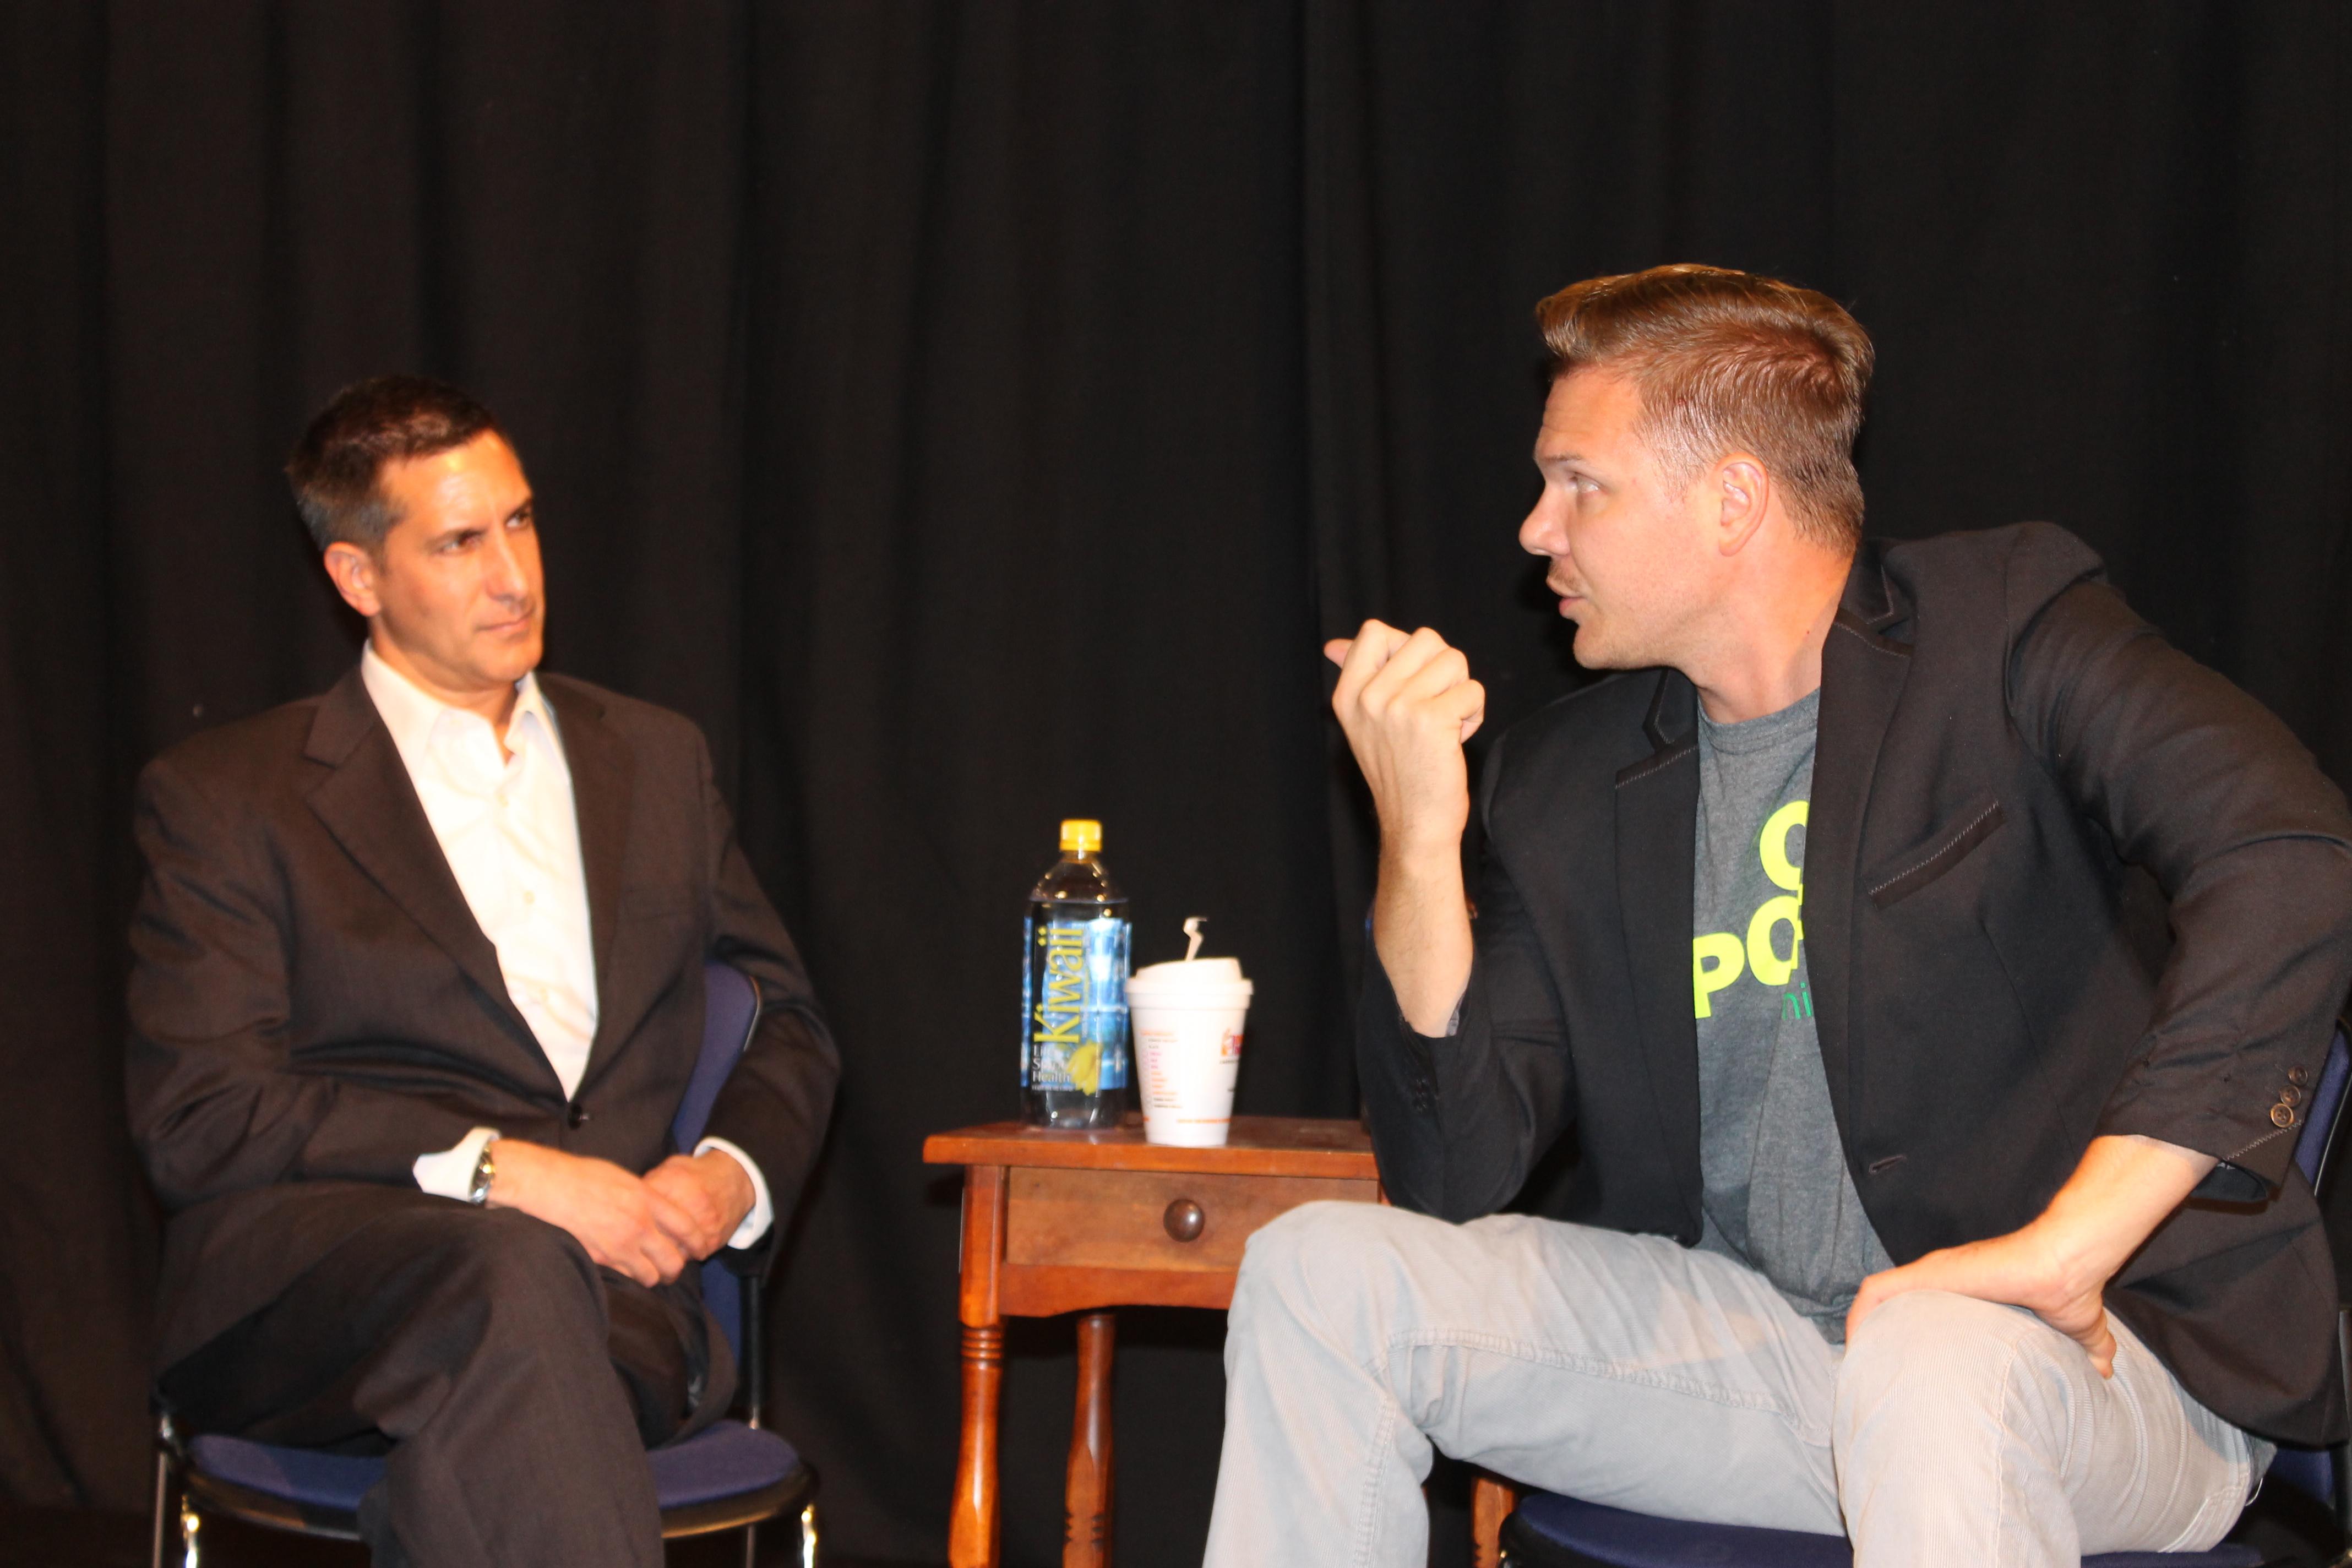 Tony Savant with Jim Parrack